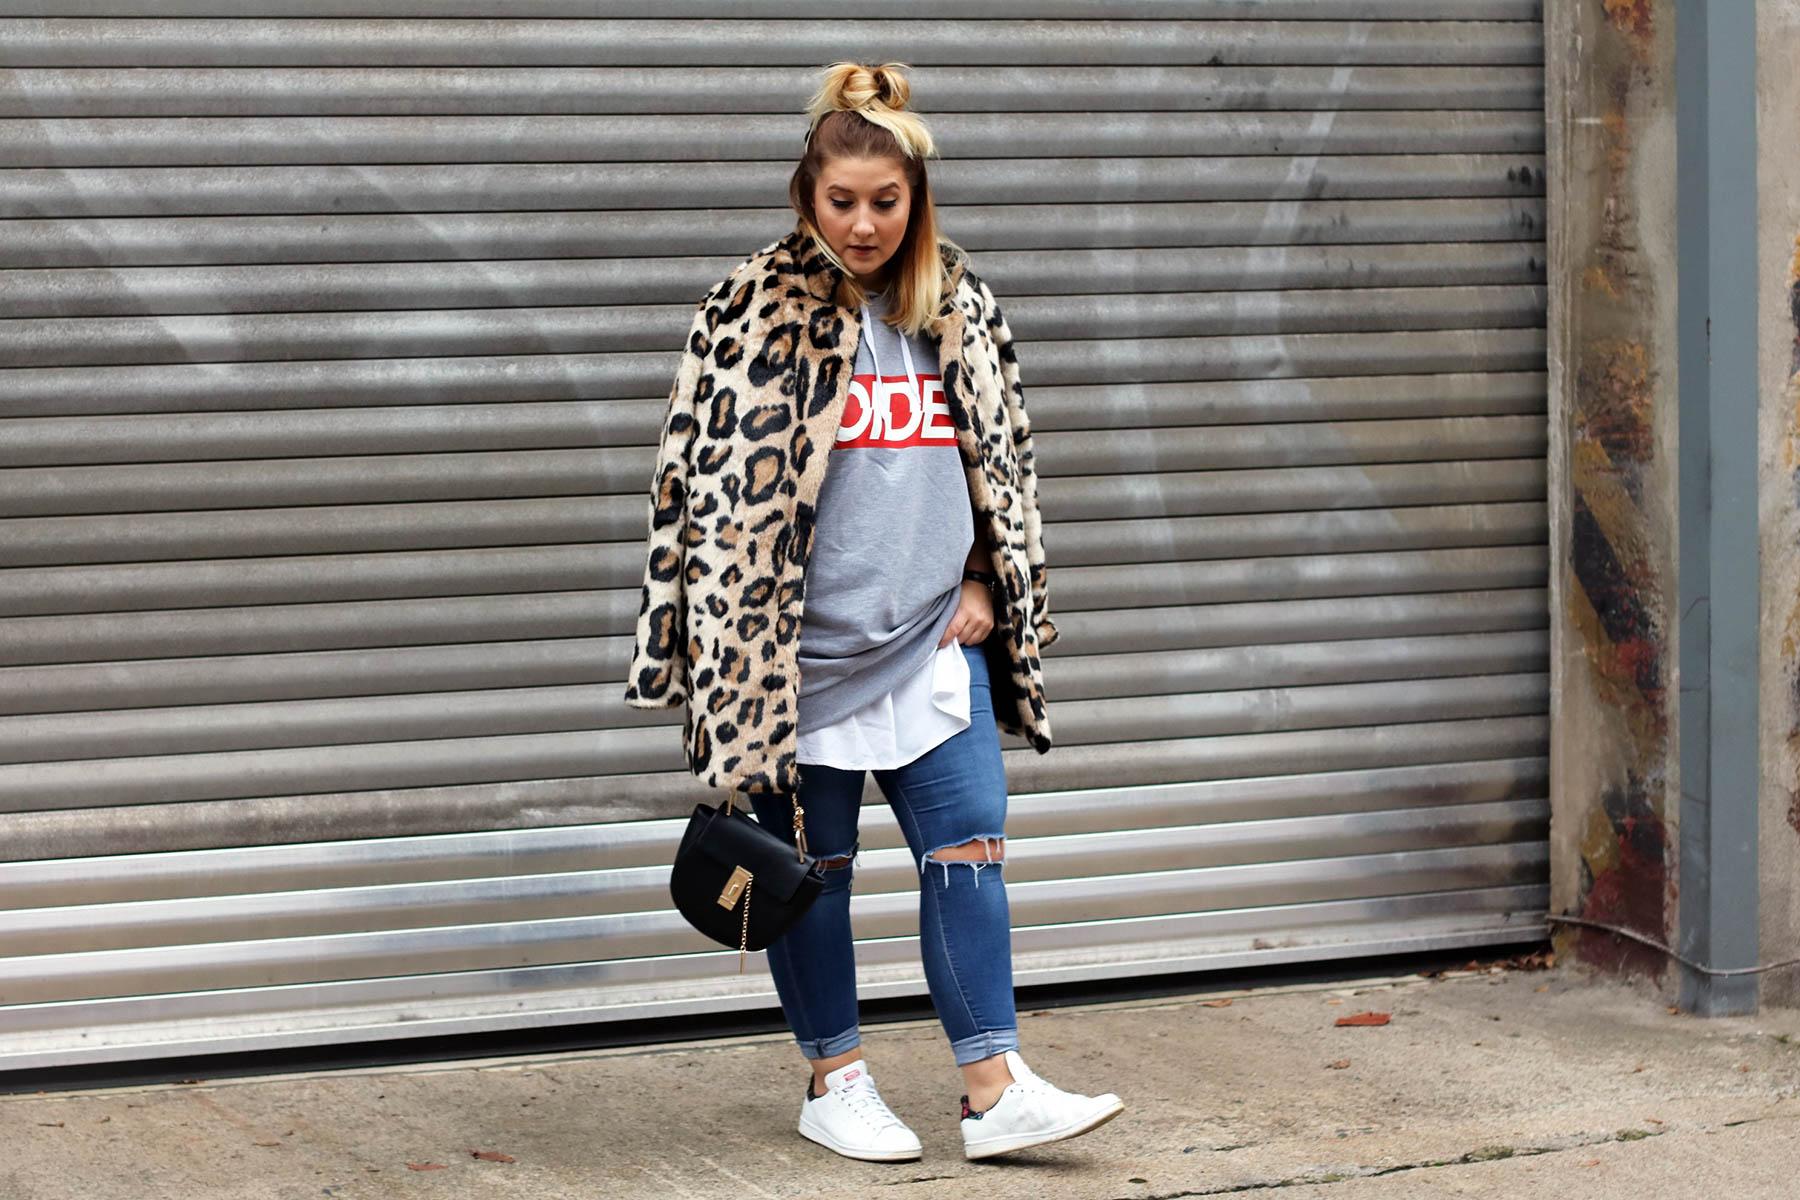 outfit-modeblog-fashionblog-fashionpassionlove-leo-mantel-trend-mantel-winter-sneaker-adidas23 (1 von 1)